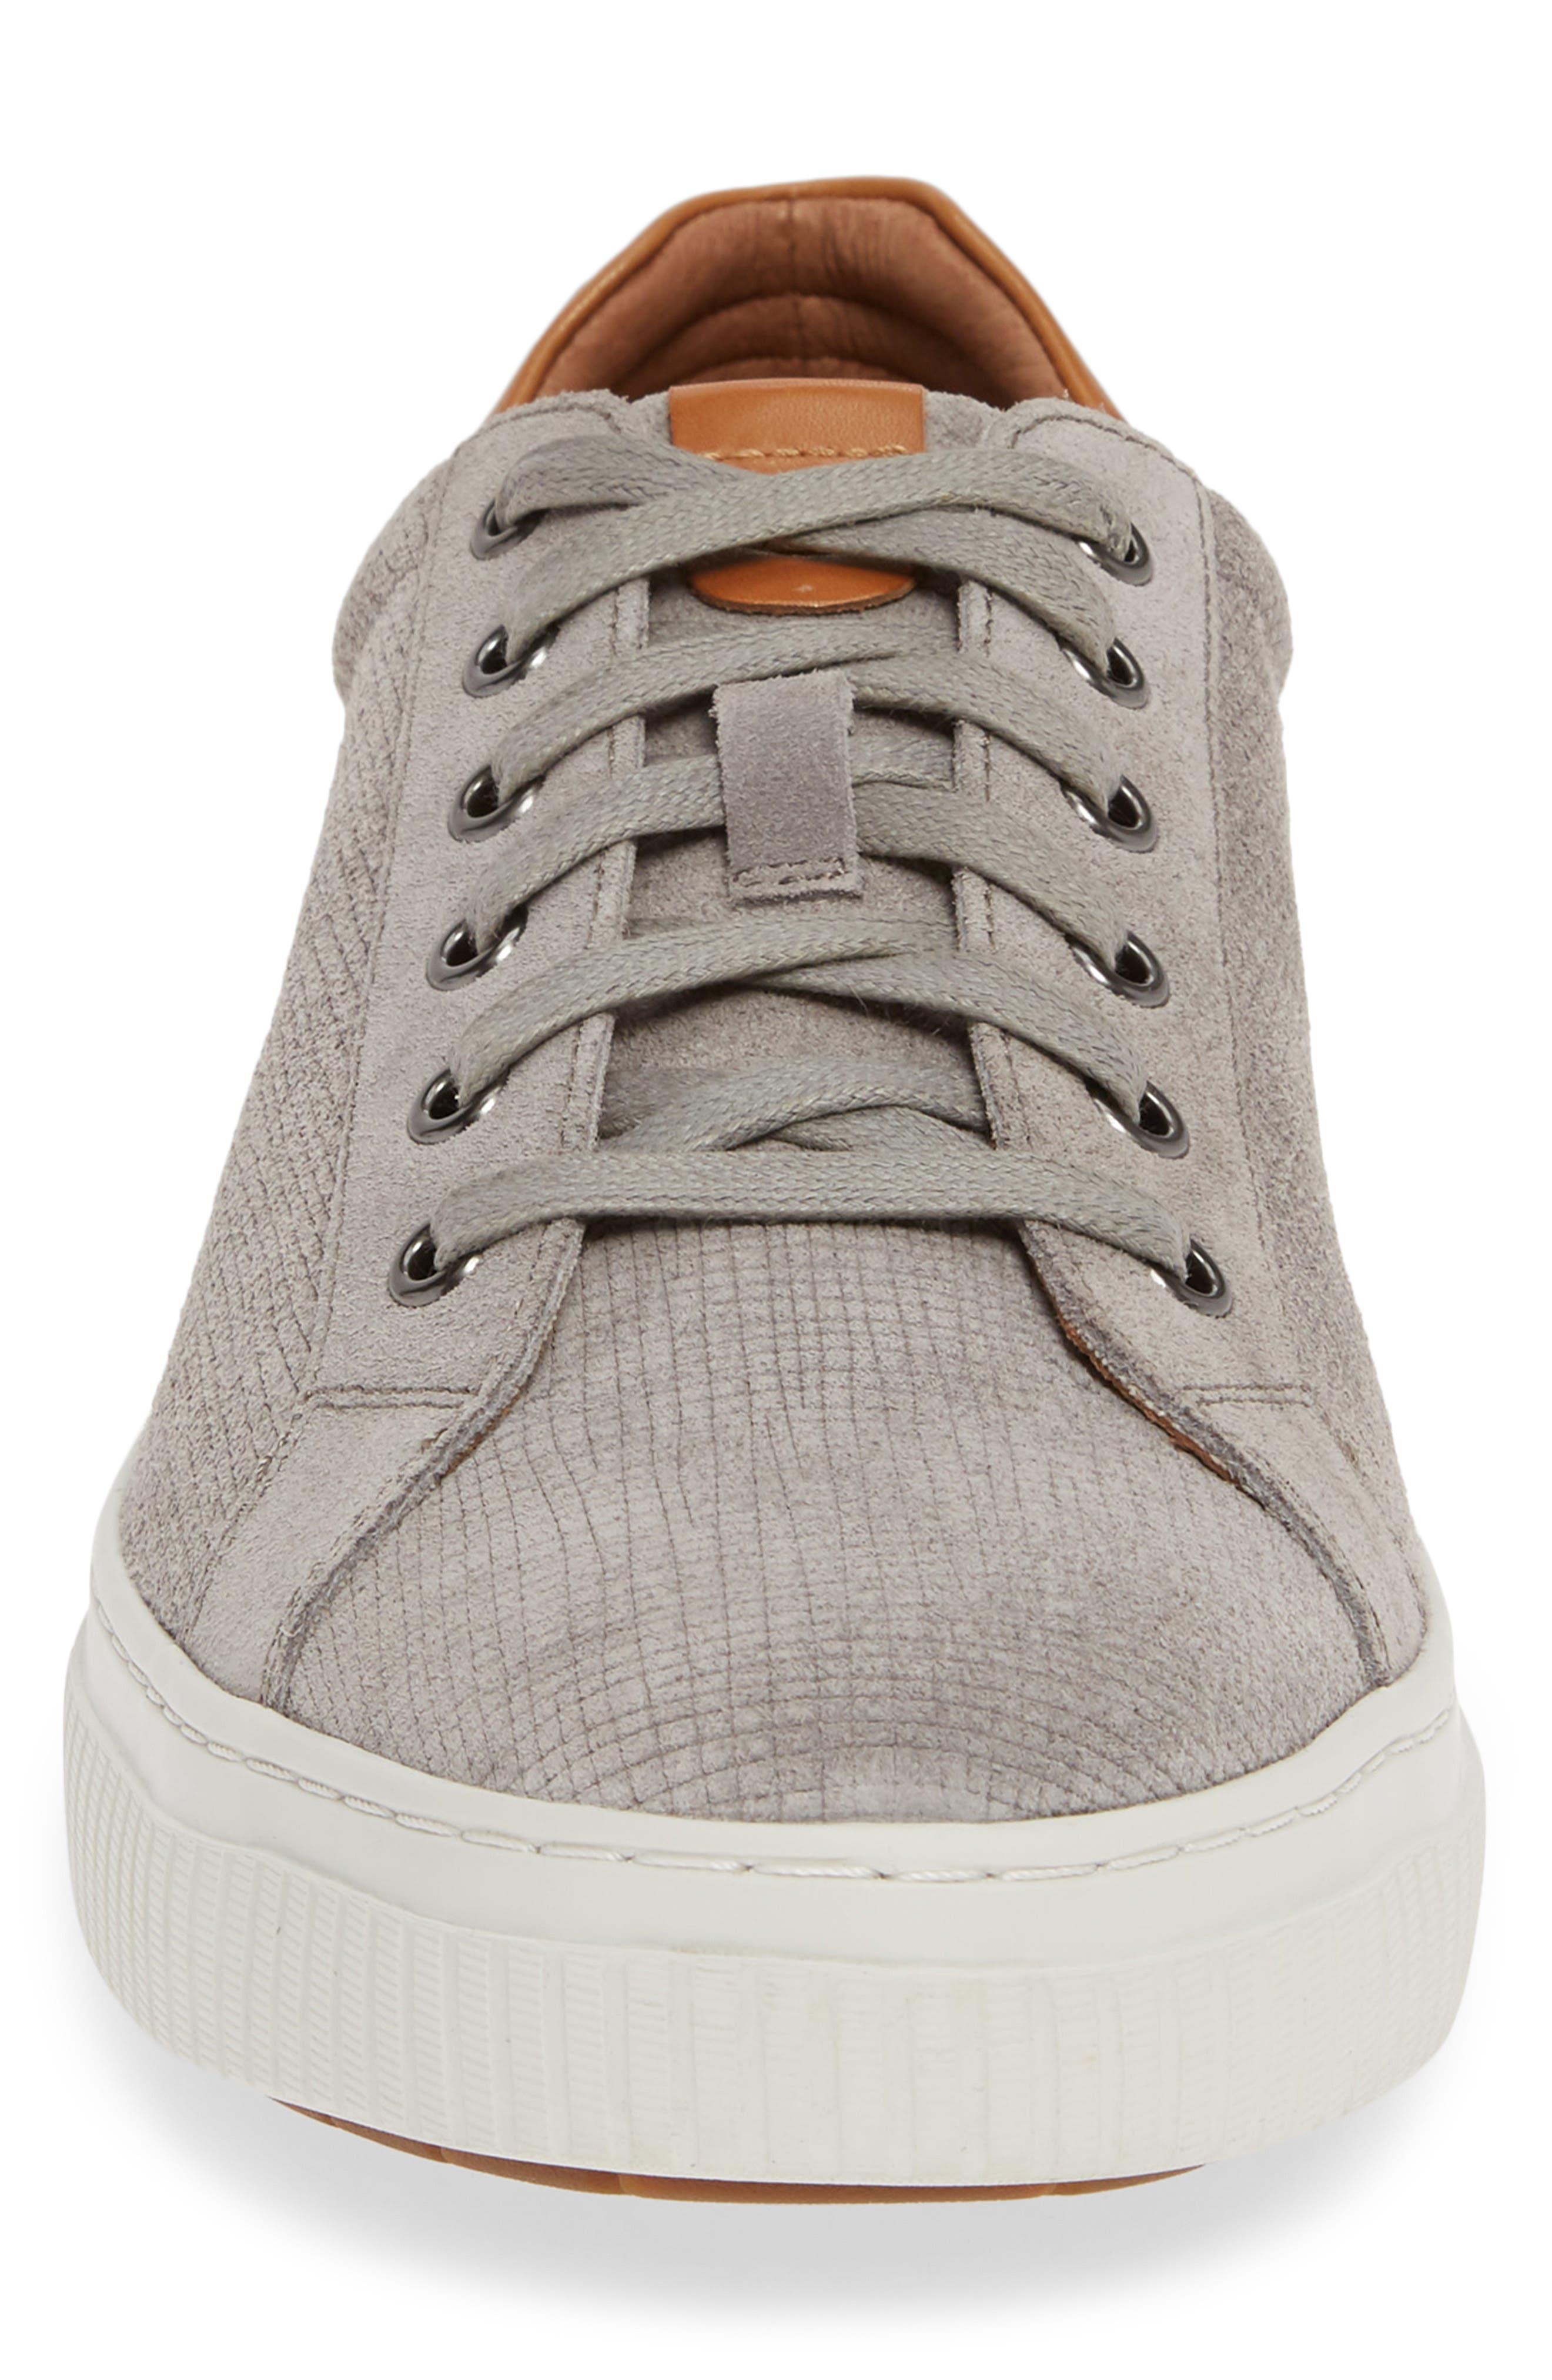 J&M 1850, Toliver Low Top Sneaker, Alternate thumbnail 4, color, GREY SUEDE